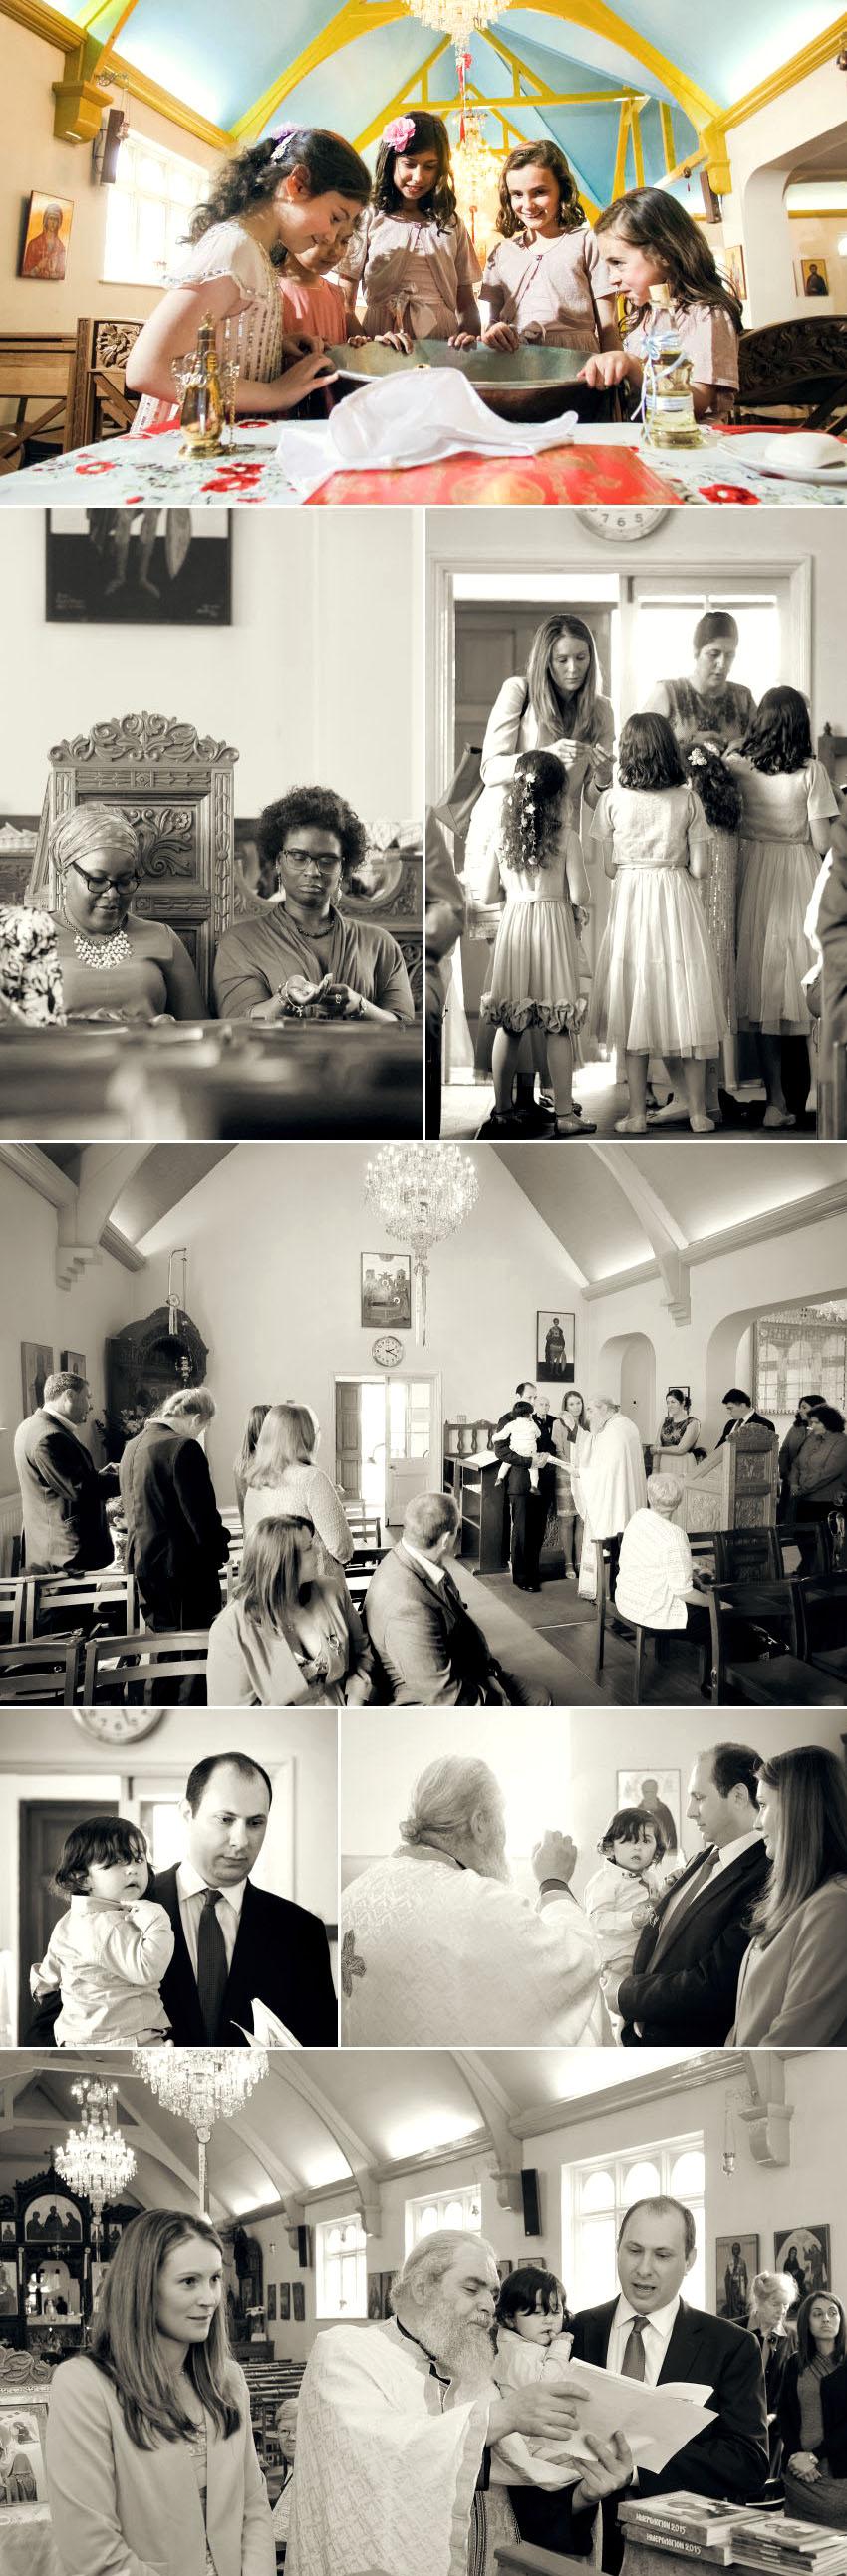 04 Christening at Greek Orthodox Church of St George in Kingston